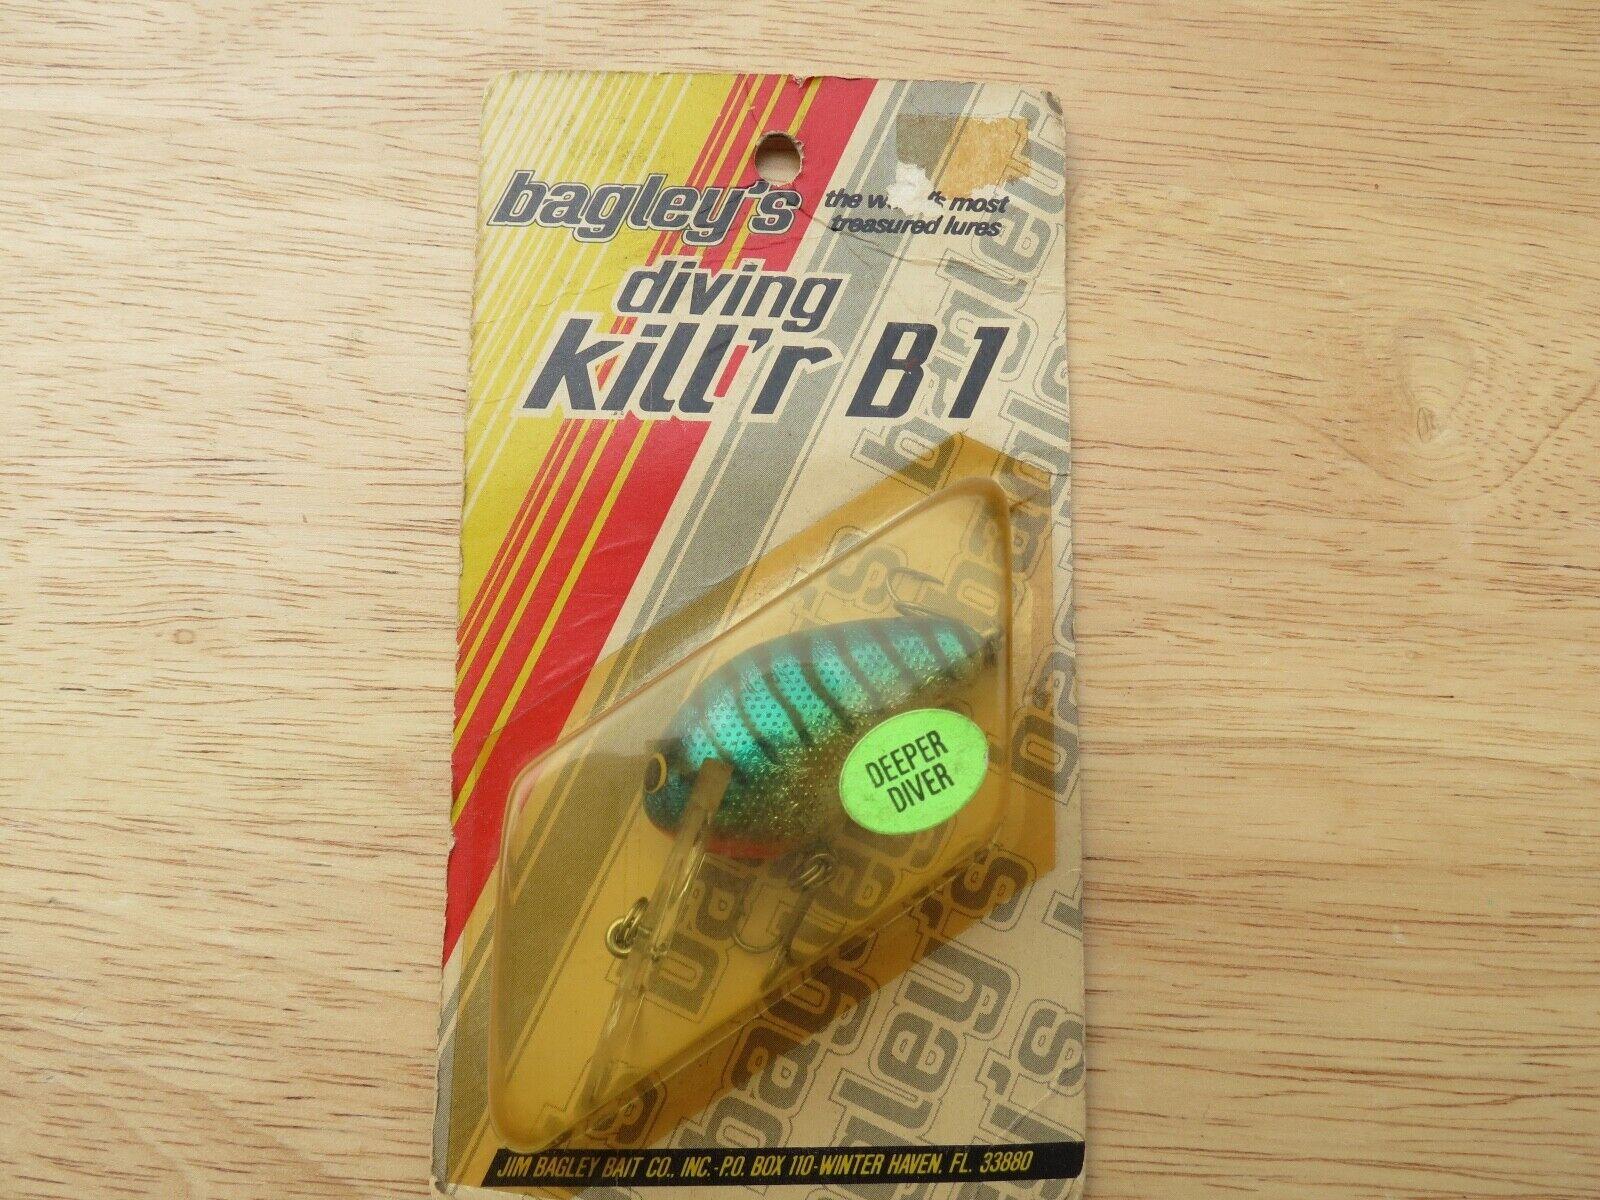 Bagleys Diving Killer B1 fishing lure made in USA (lot)